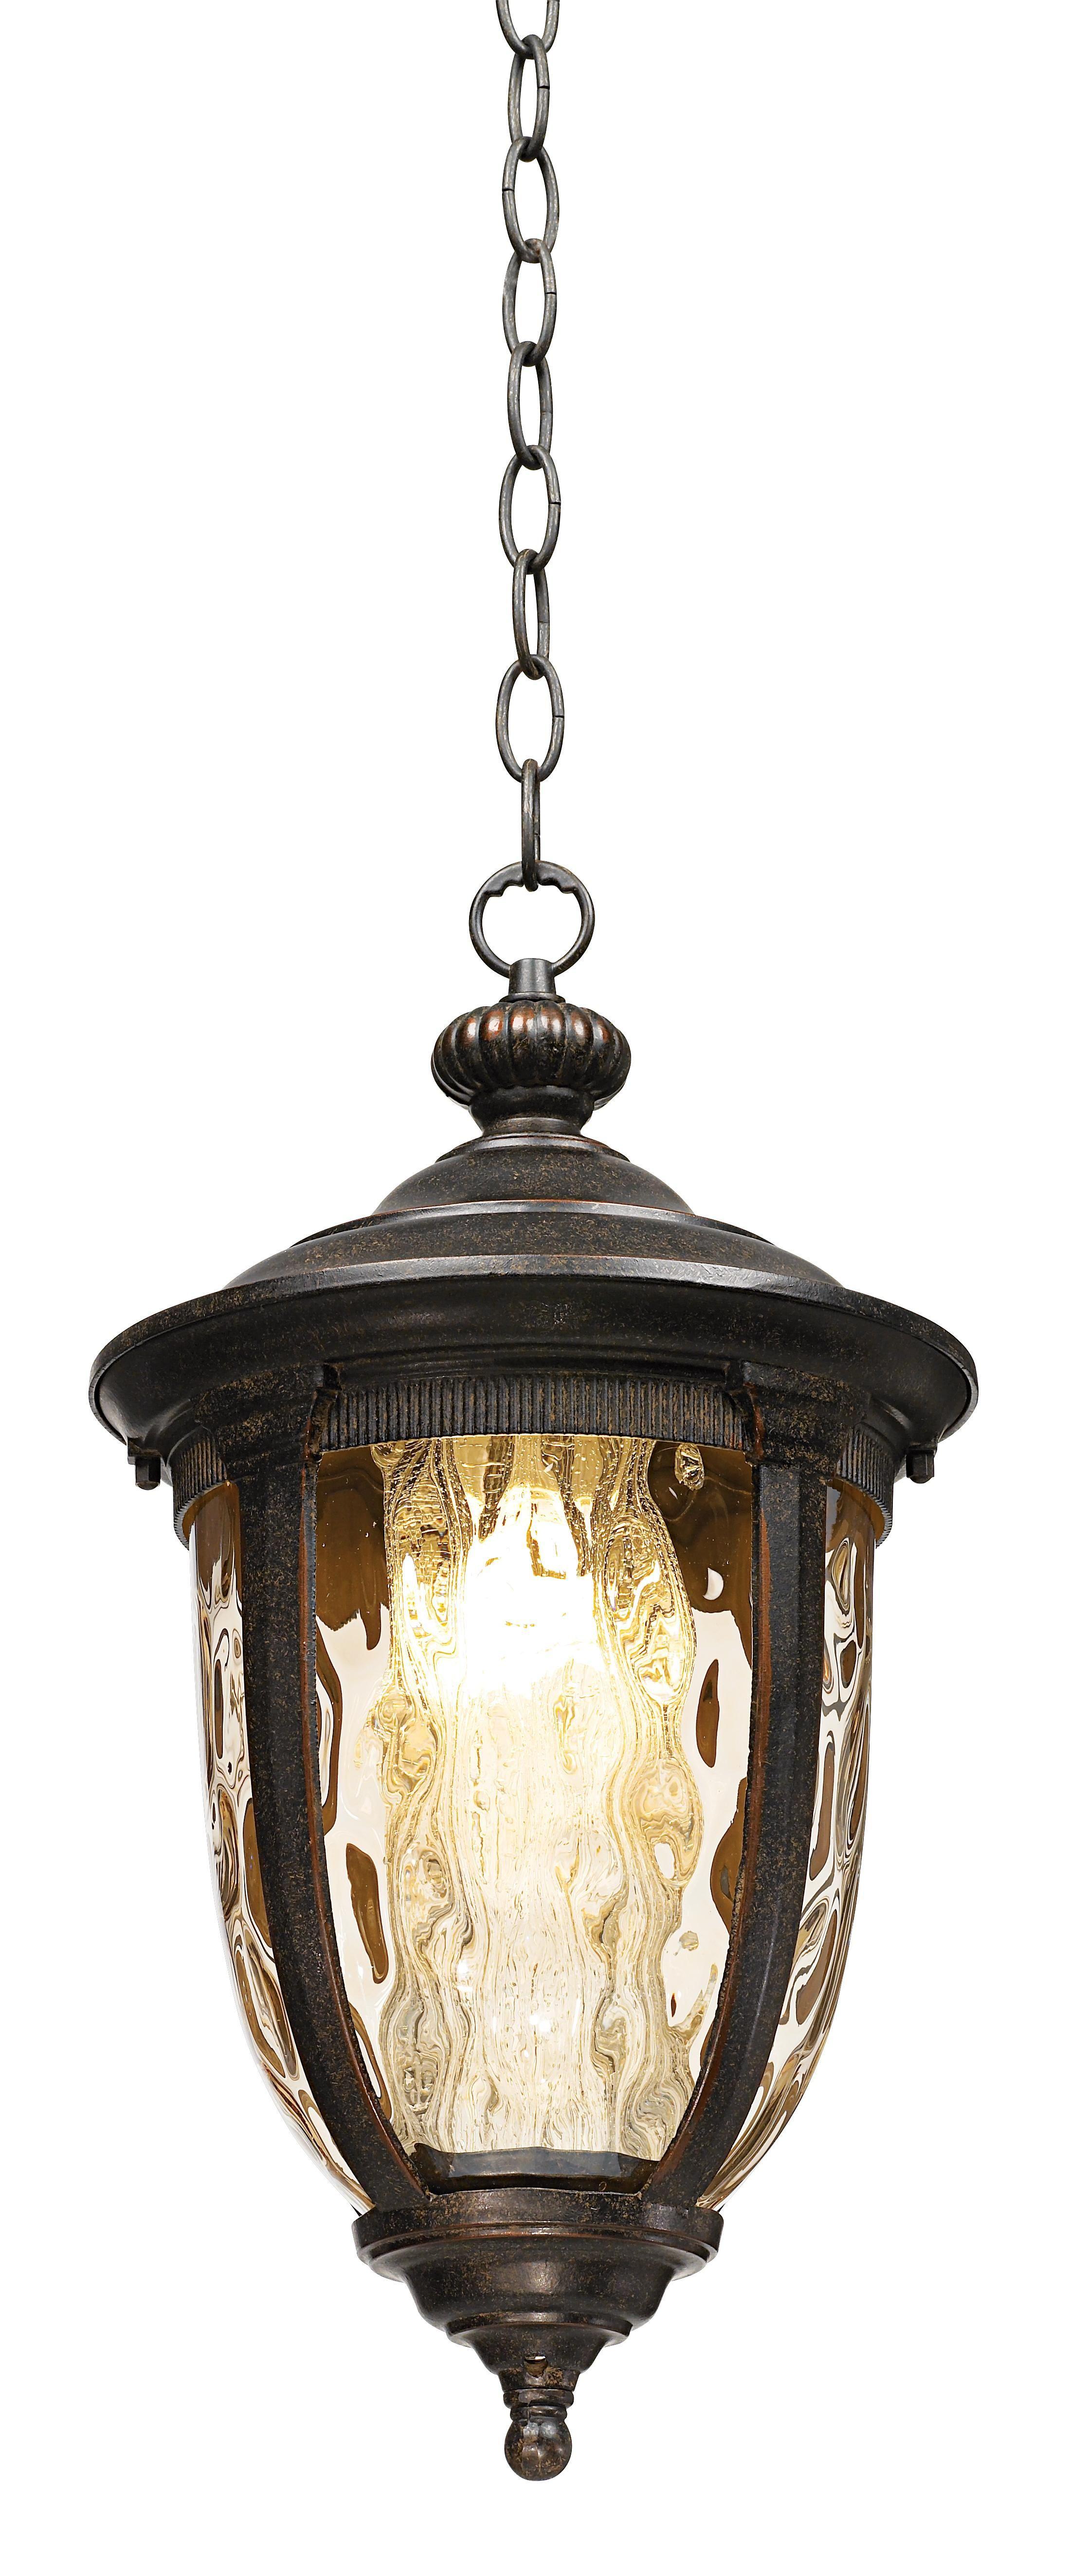 Bellagio 18 High Energy Efficient Outdoor Hanging Light 42550 Lamps Plus Outdoor Hanging Light Hanging Lights Hanging Light Lamp